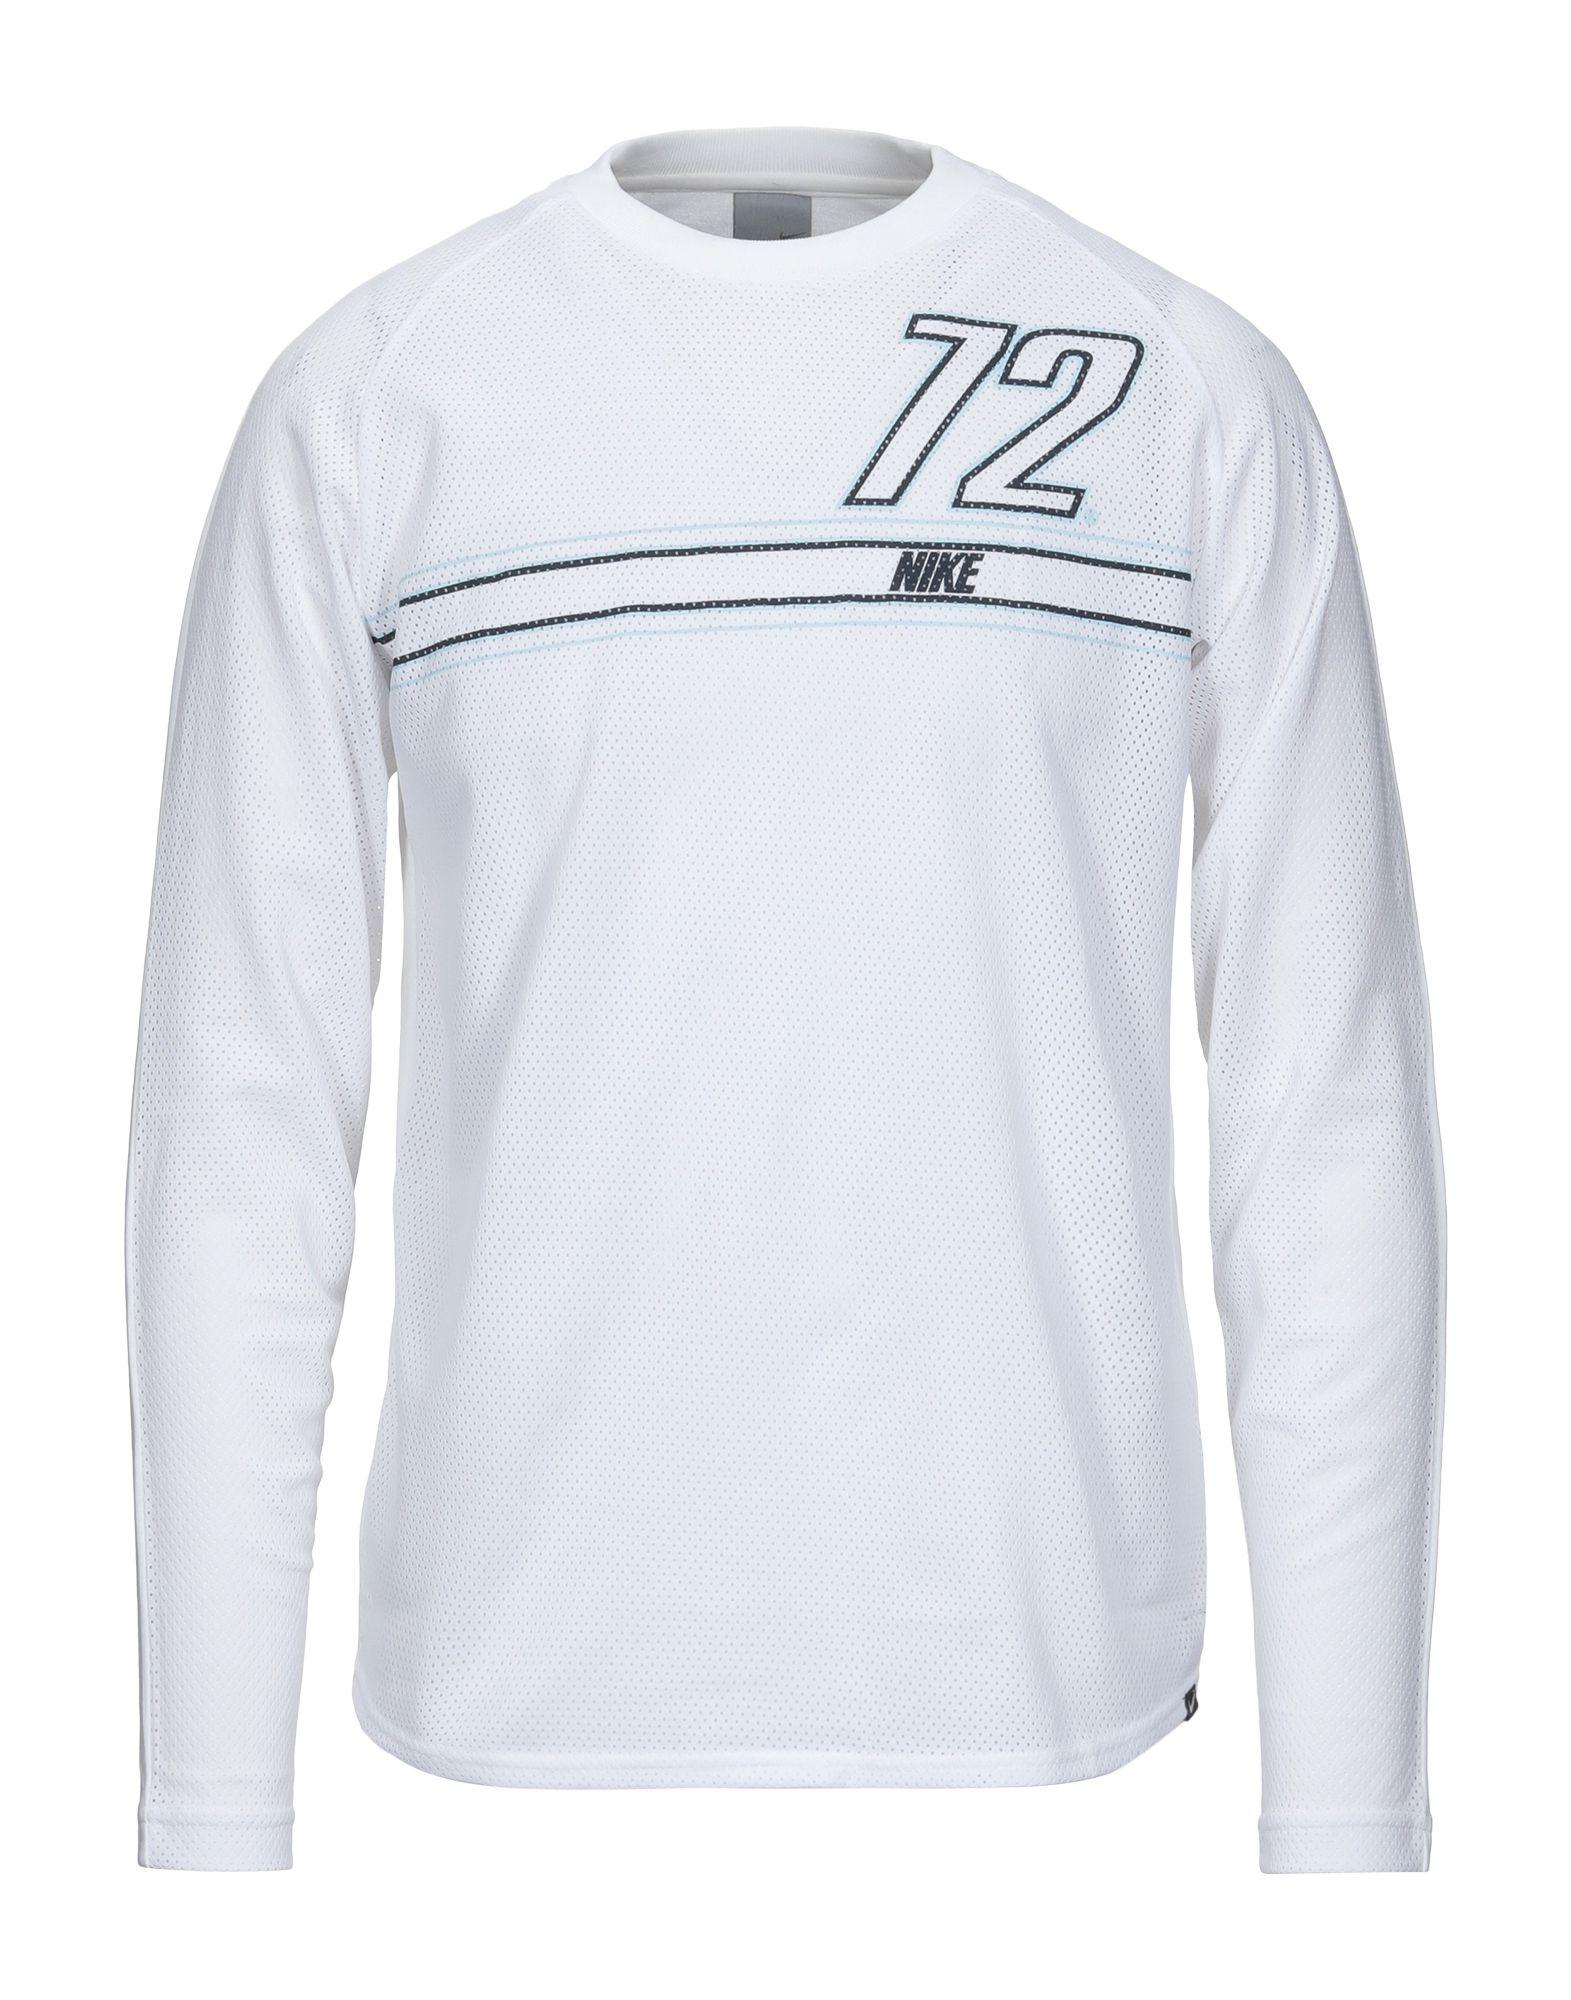 Small Heather Grey NFL Ultra Game Cincinnati Bengals Active Long Sleeve Tee Shirt